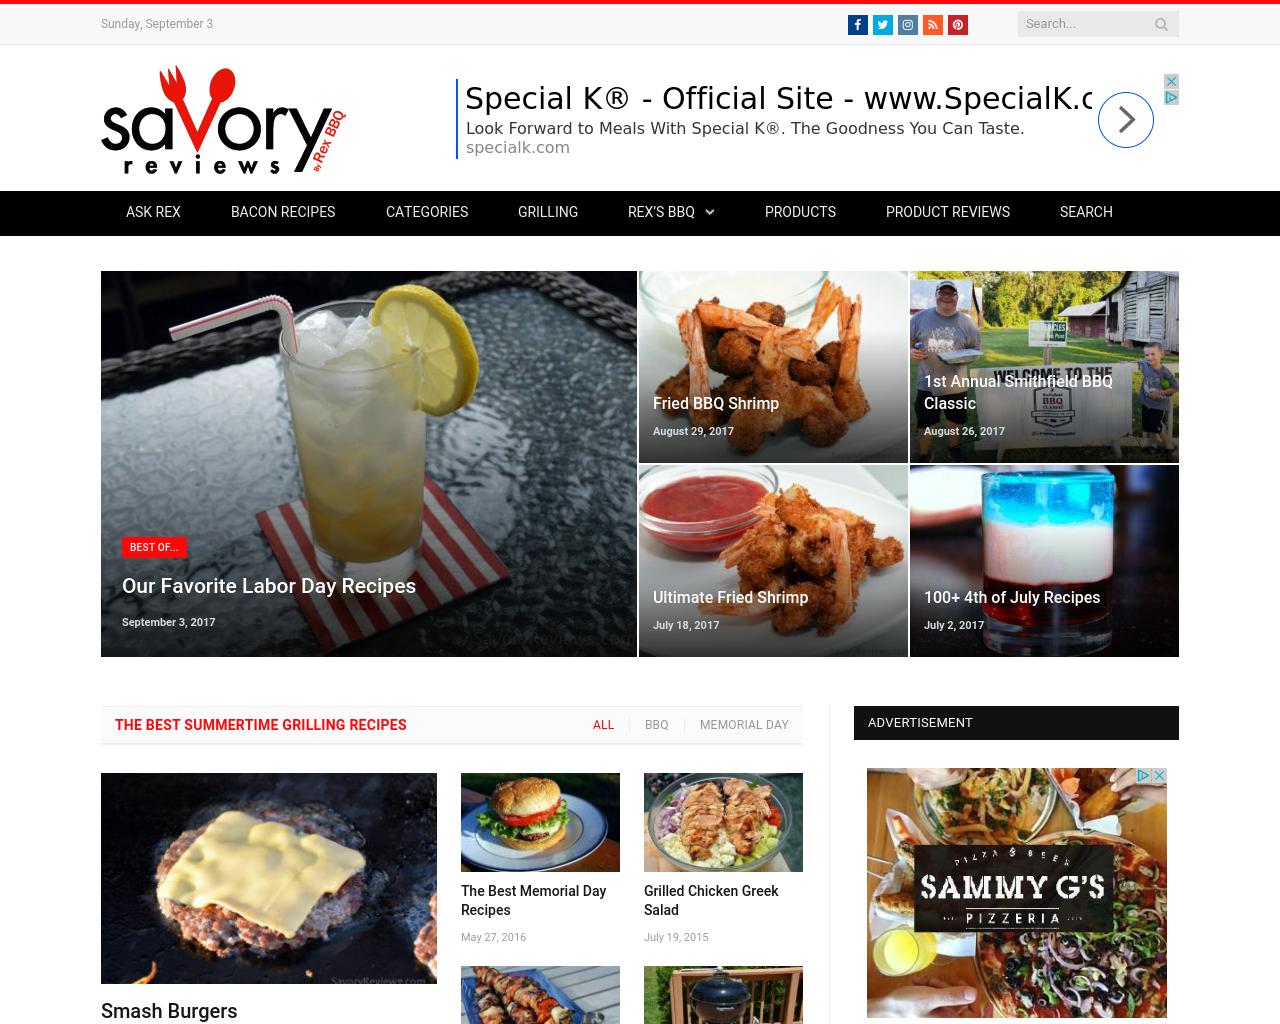 Savory-Reviews-Advertising-Reviews-Pricing